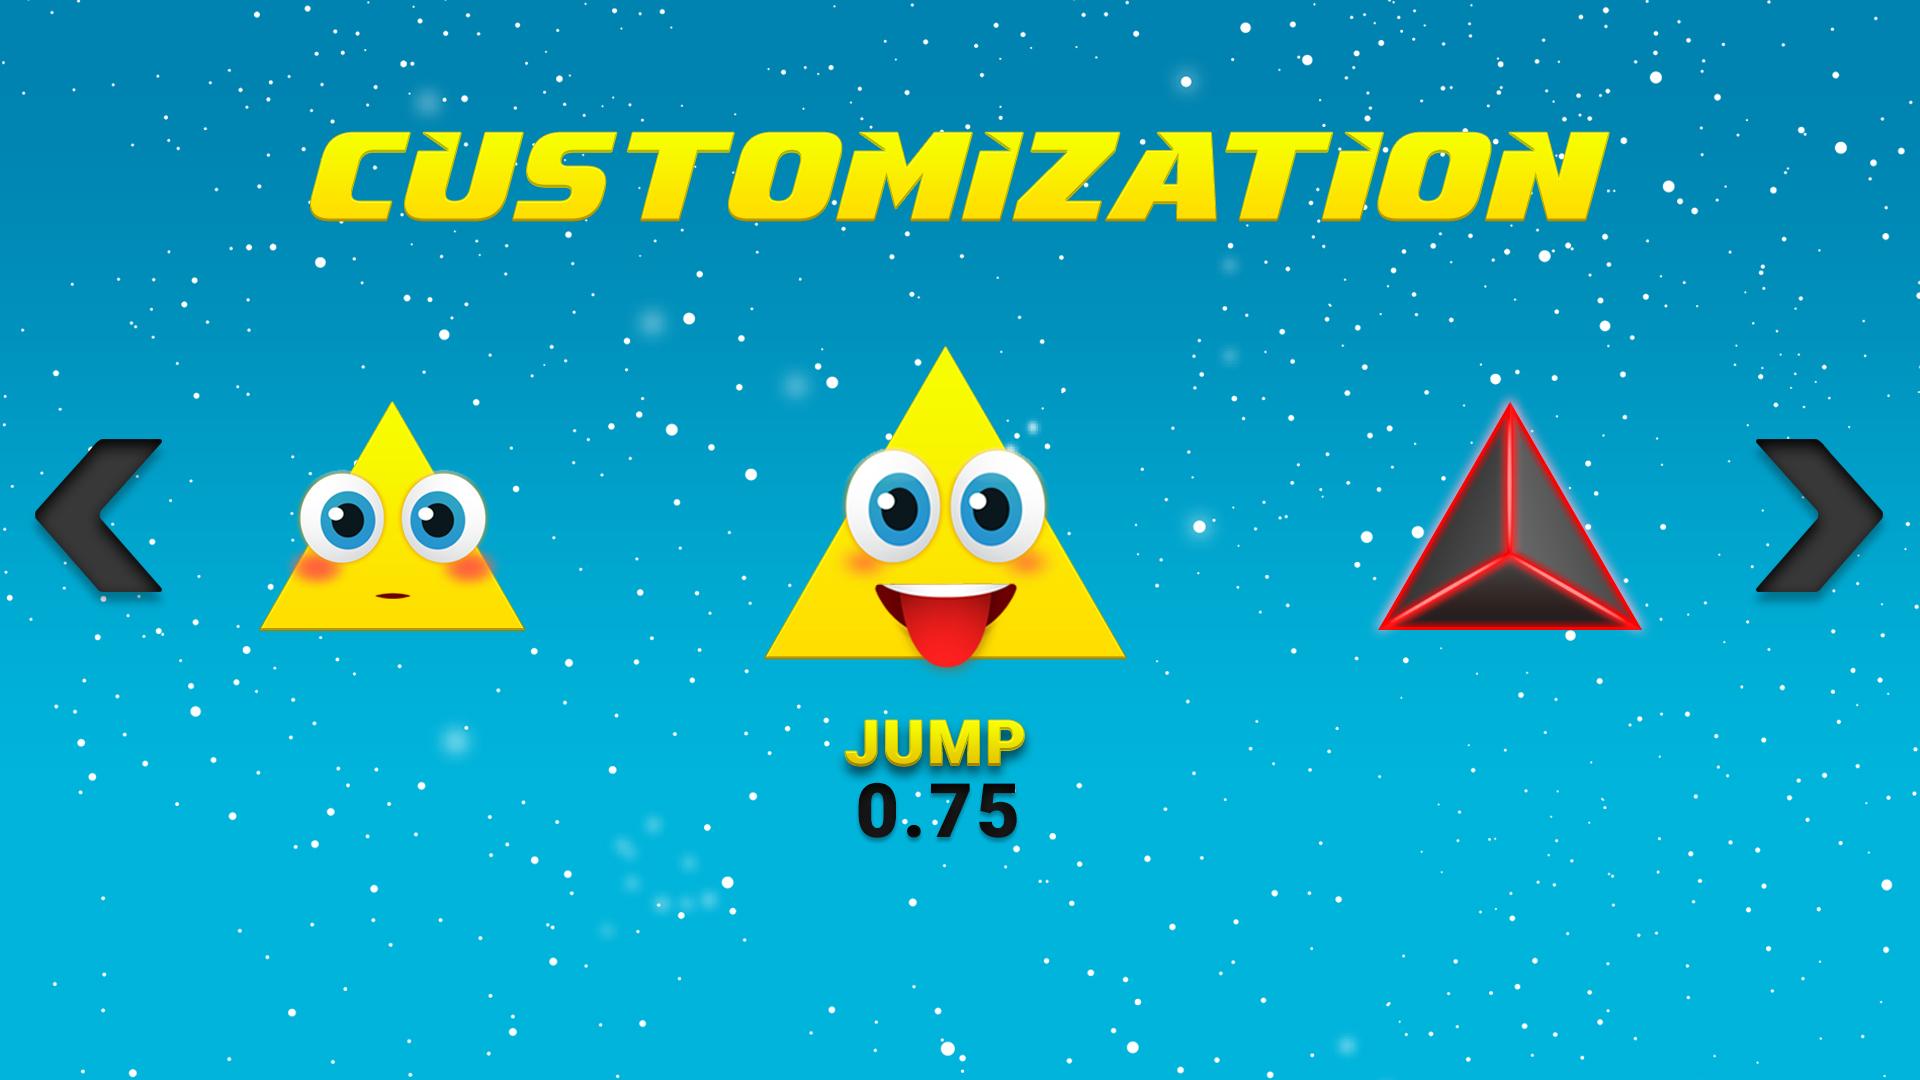 Jumping Triangle Pyramid